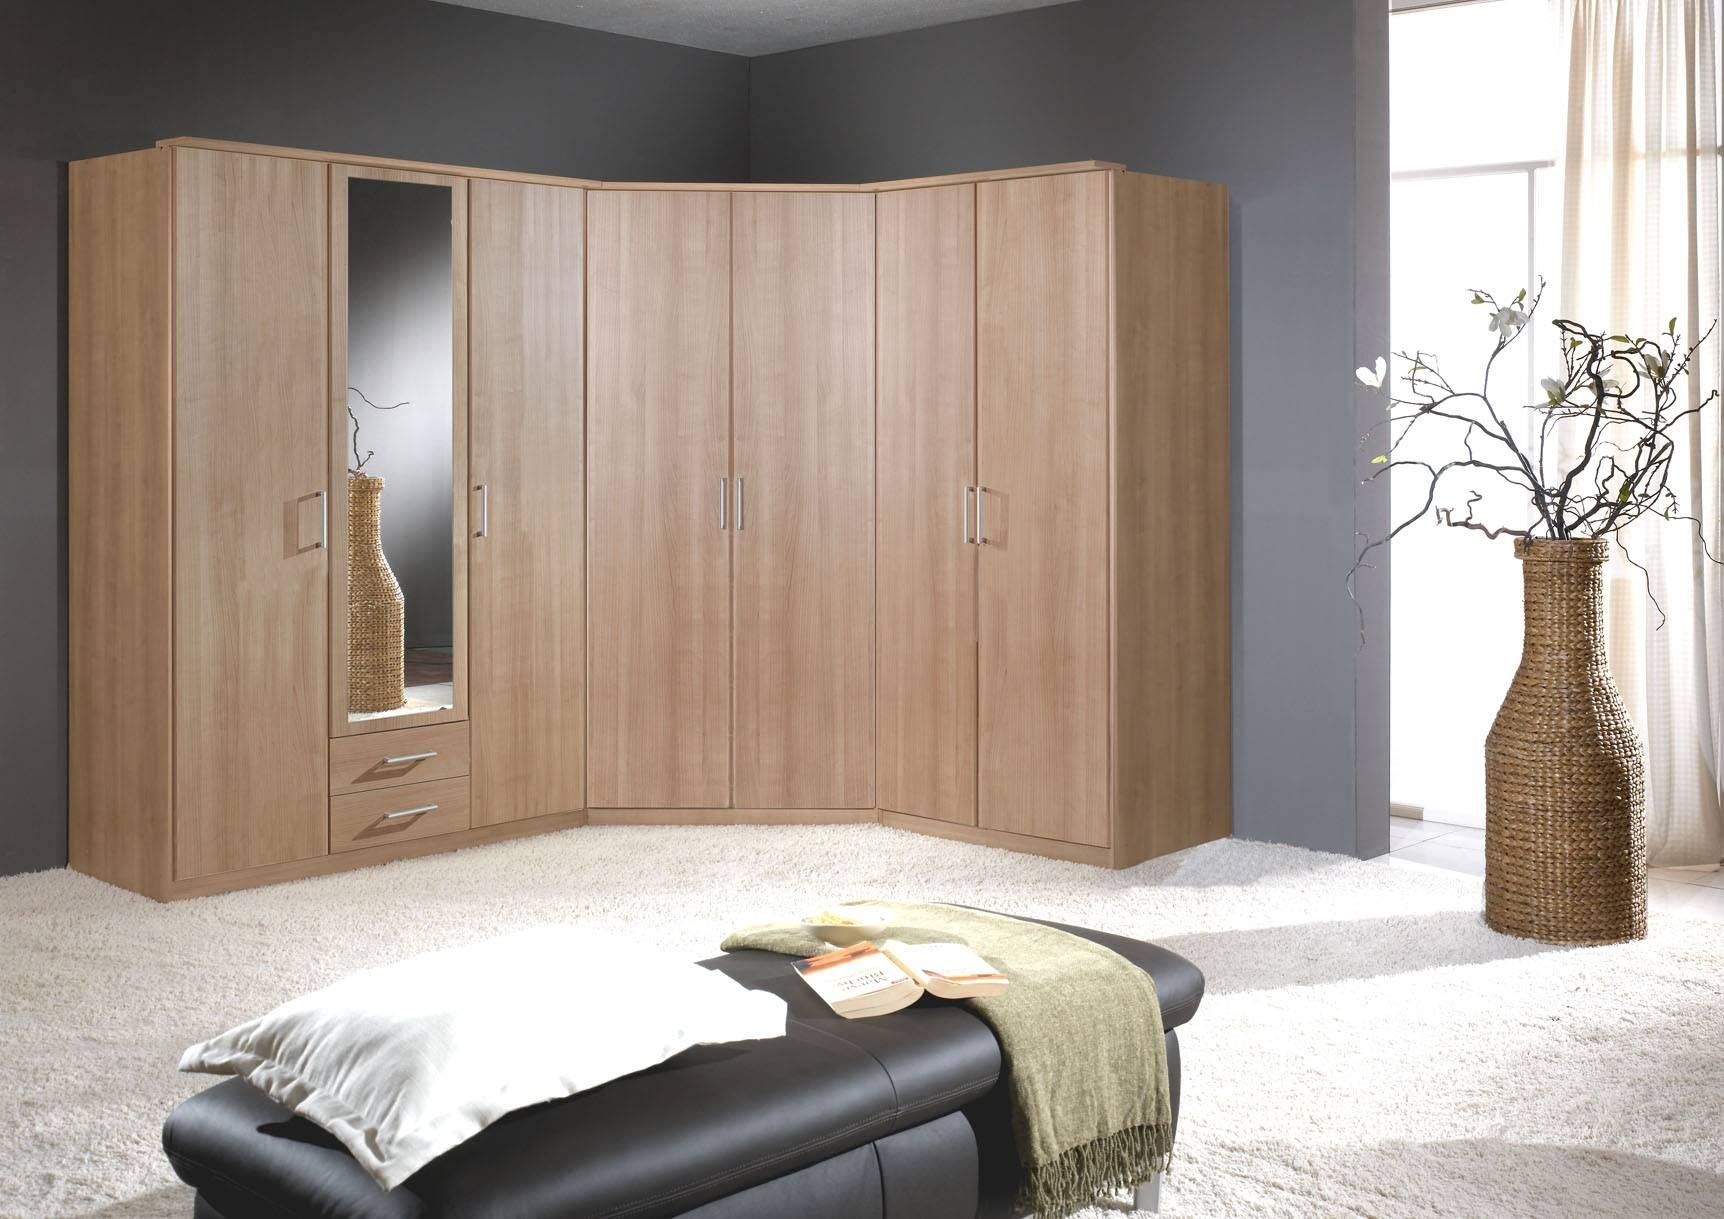 Small Corner Bedroom Units Best Ideas About Bedrooms Nursery Kids regarding Small Corner Wardrobes (Image 11 of 15)